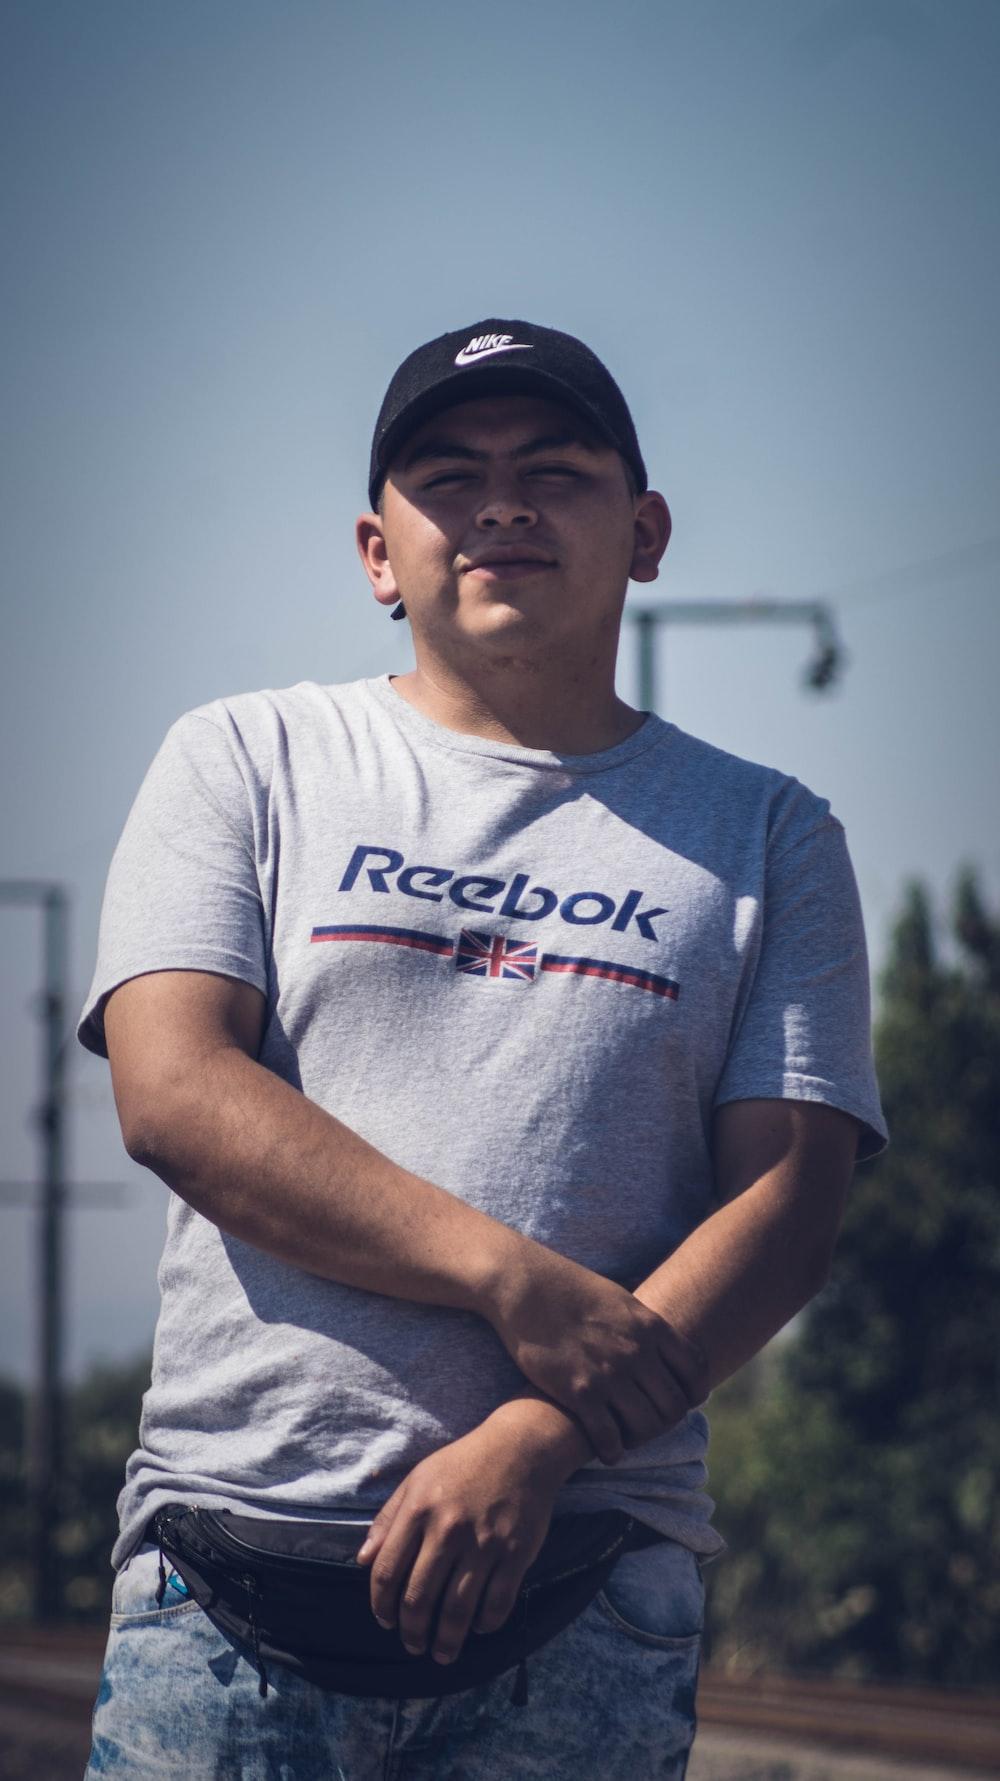 man in gray crew neck t-shirt wearing black cap